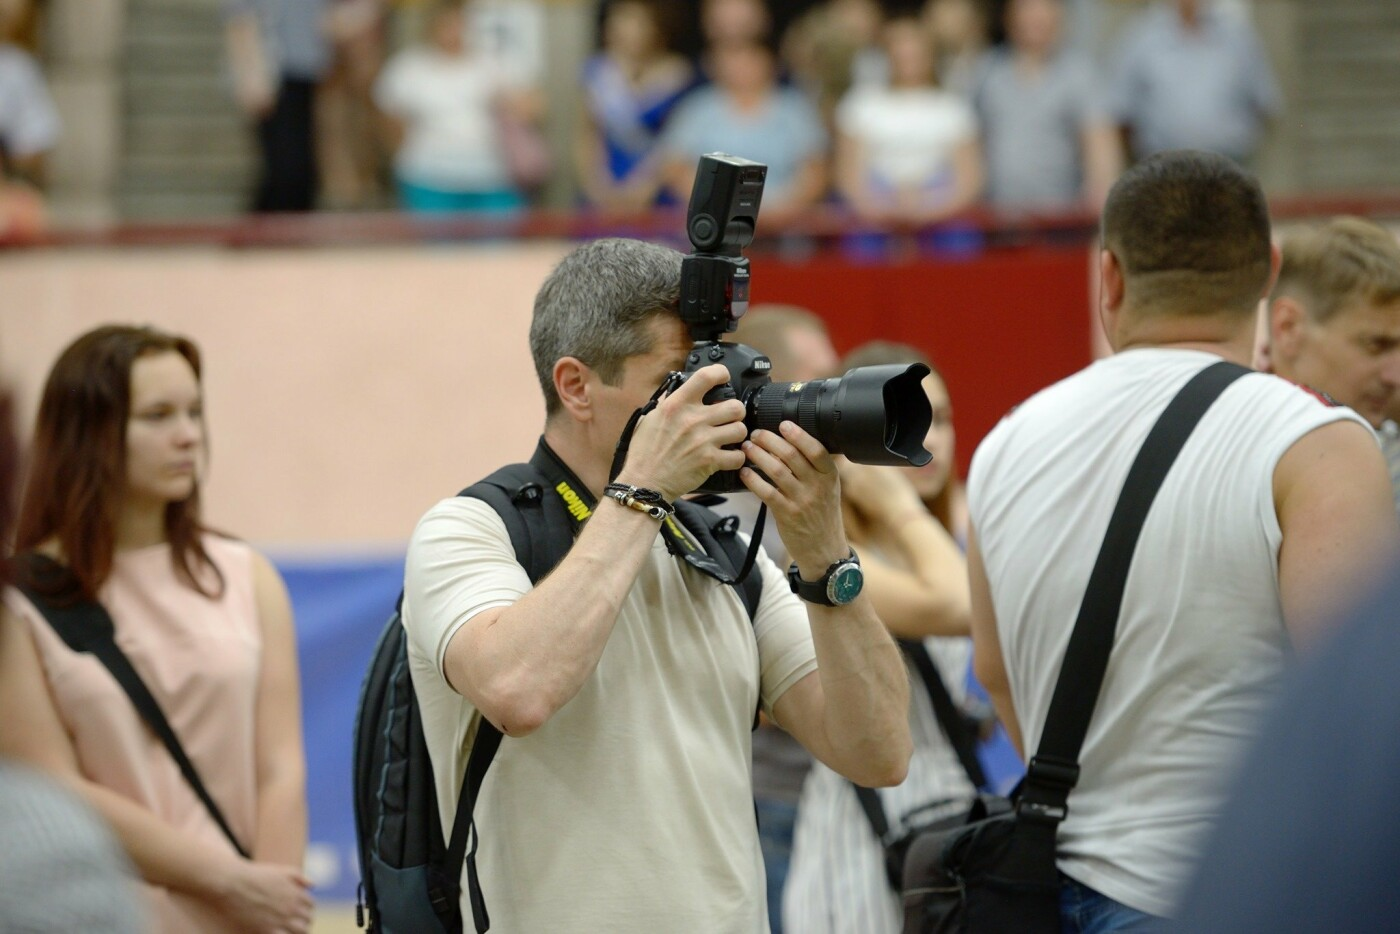 В фокусе объектива: северодонецкий фотограф Константин Скоморох, фото-1